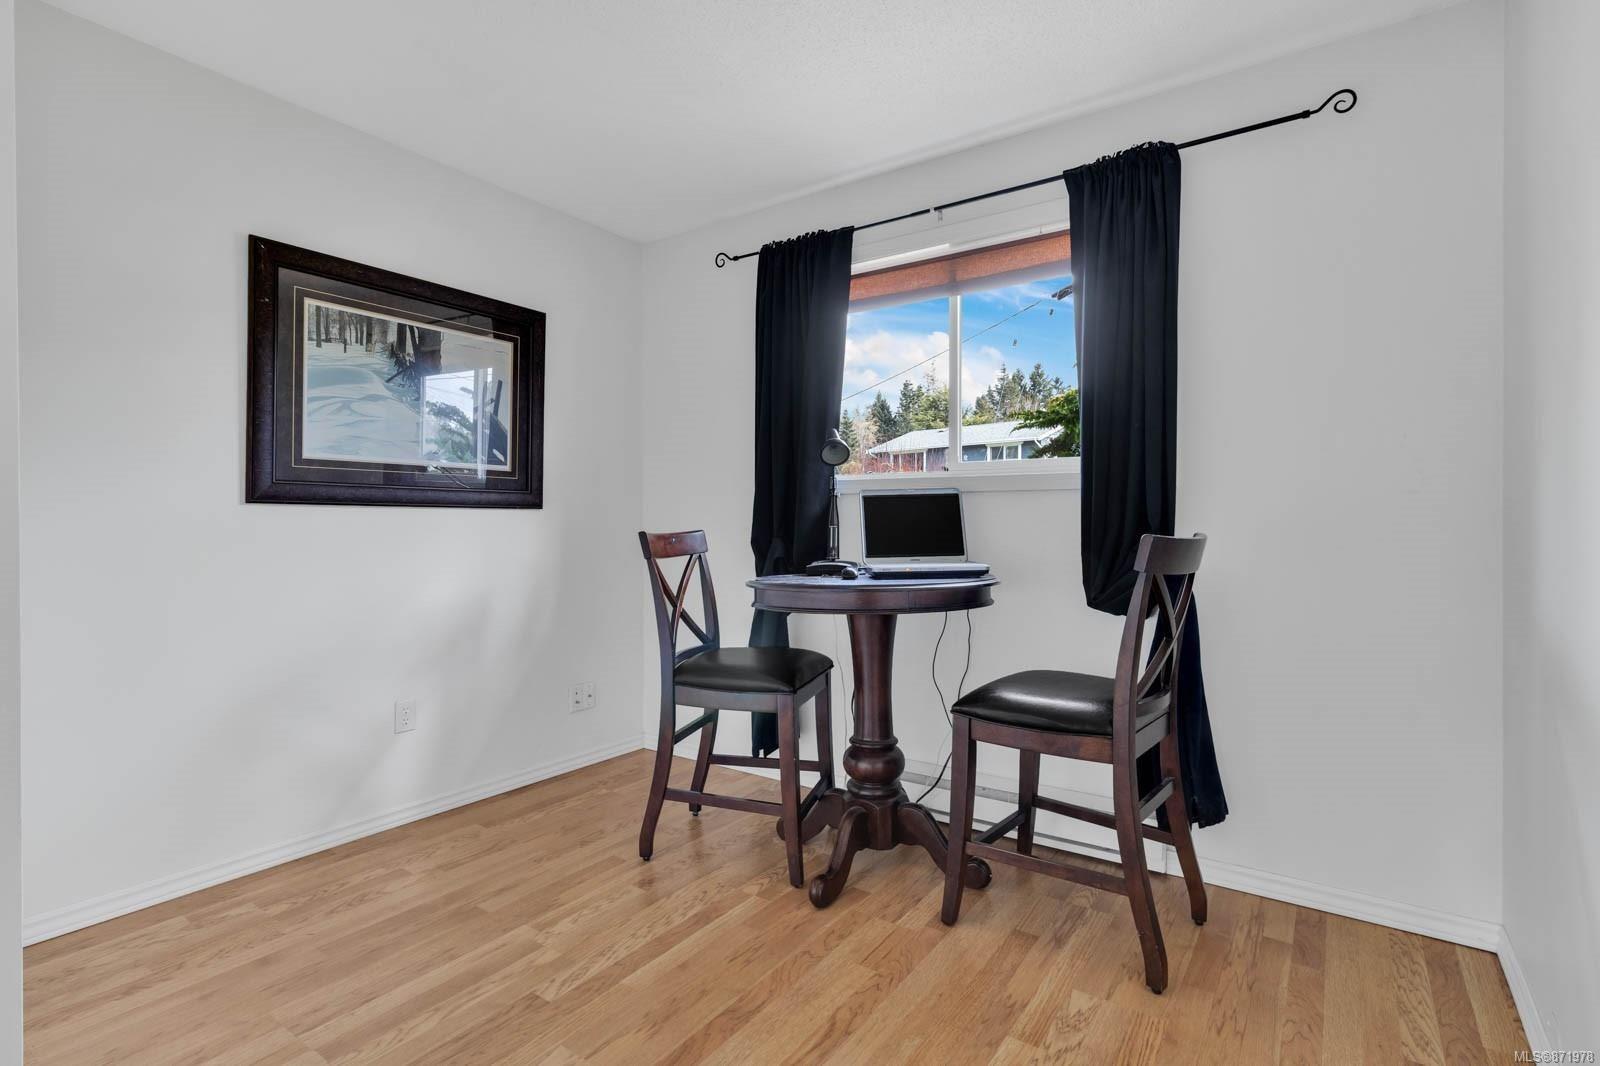 Photo 18: Photos: 1539 Chilcotin Cres in : CV Comox (Town of) House for sale (Comox Valley)  : MLS®# 871978